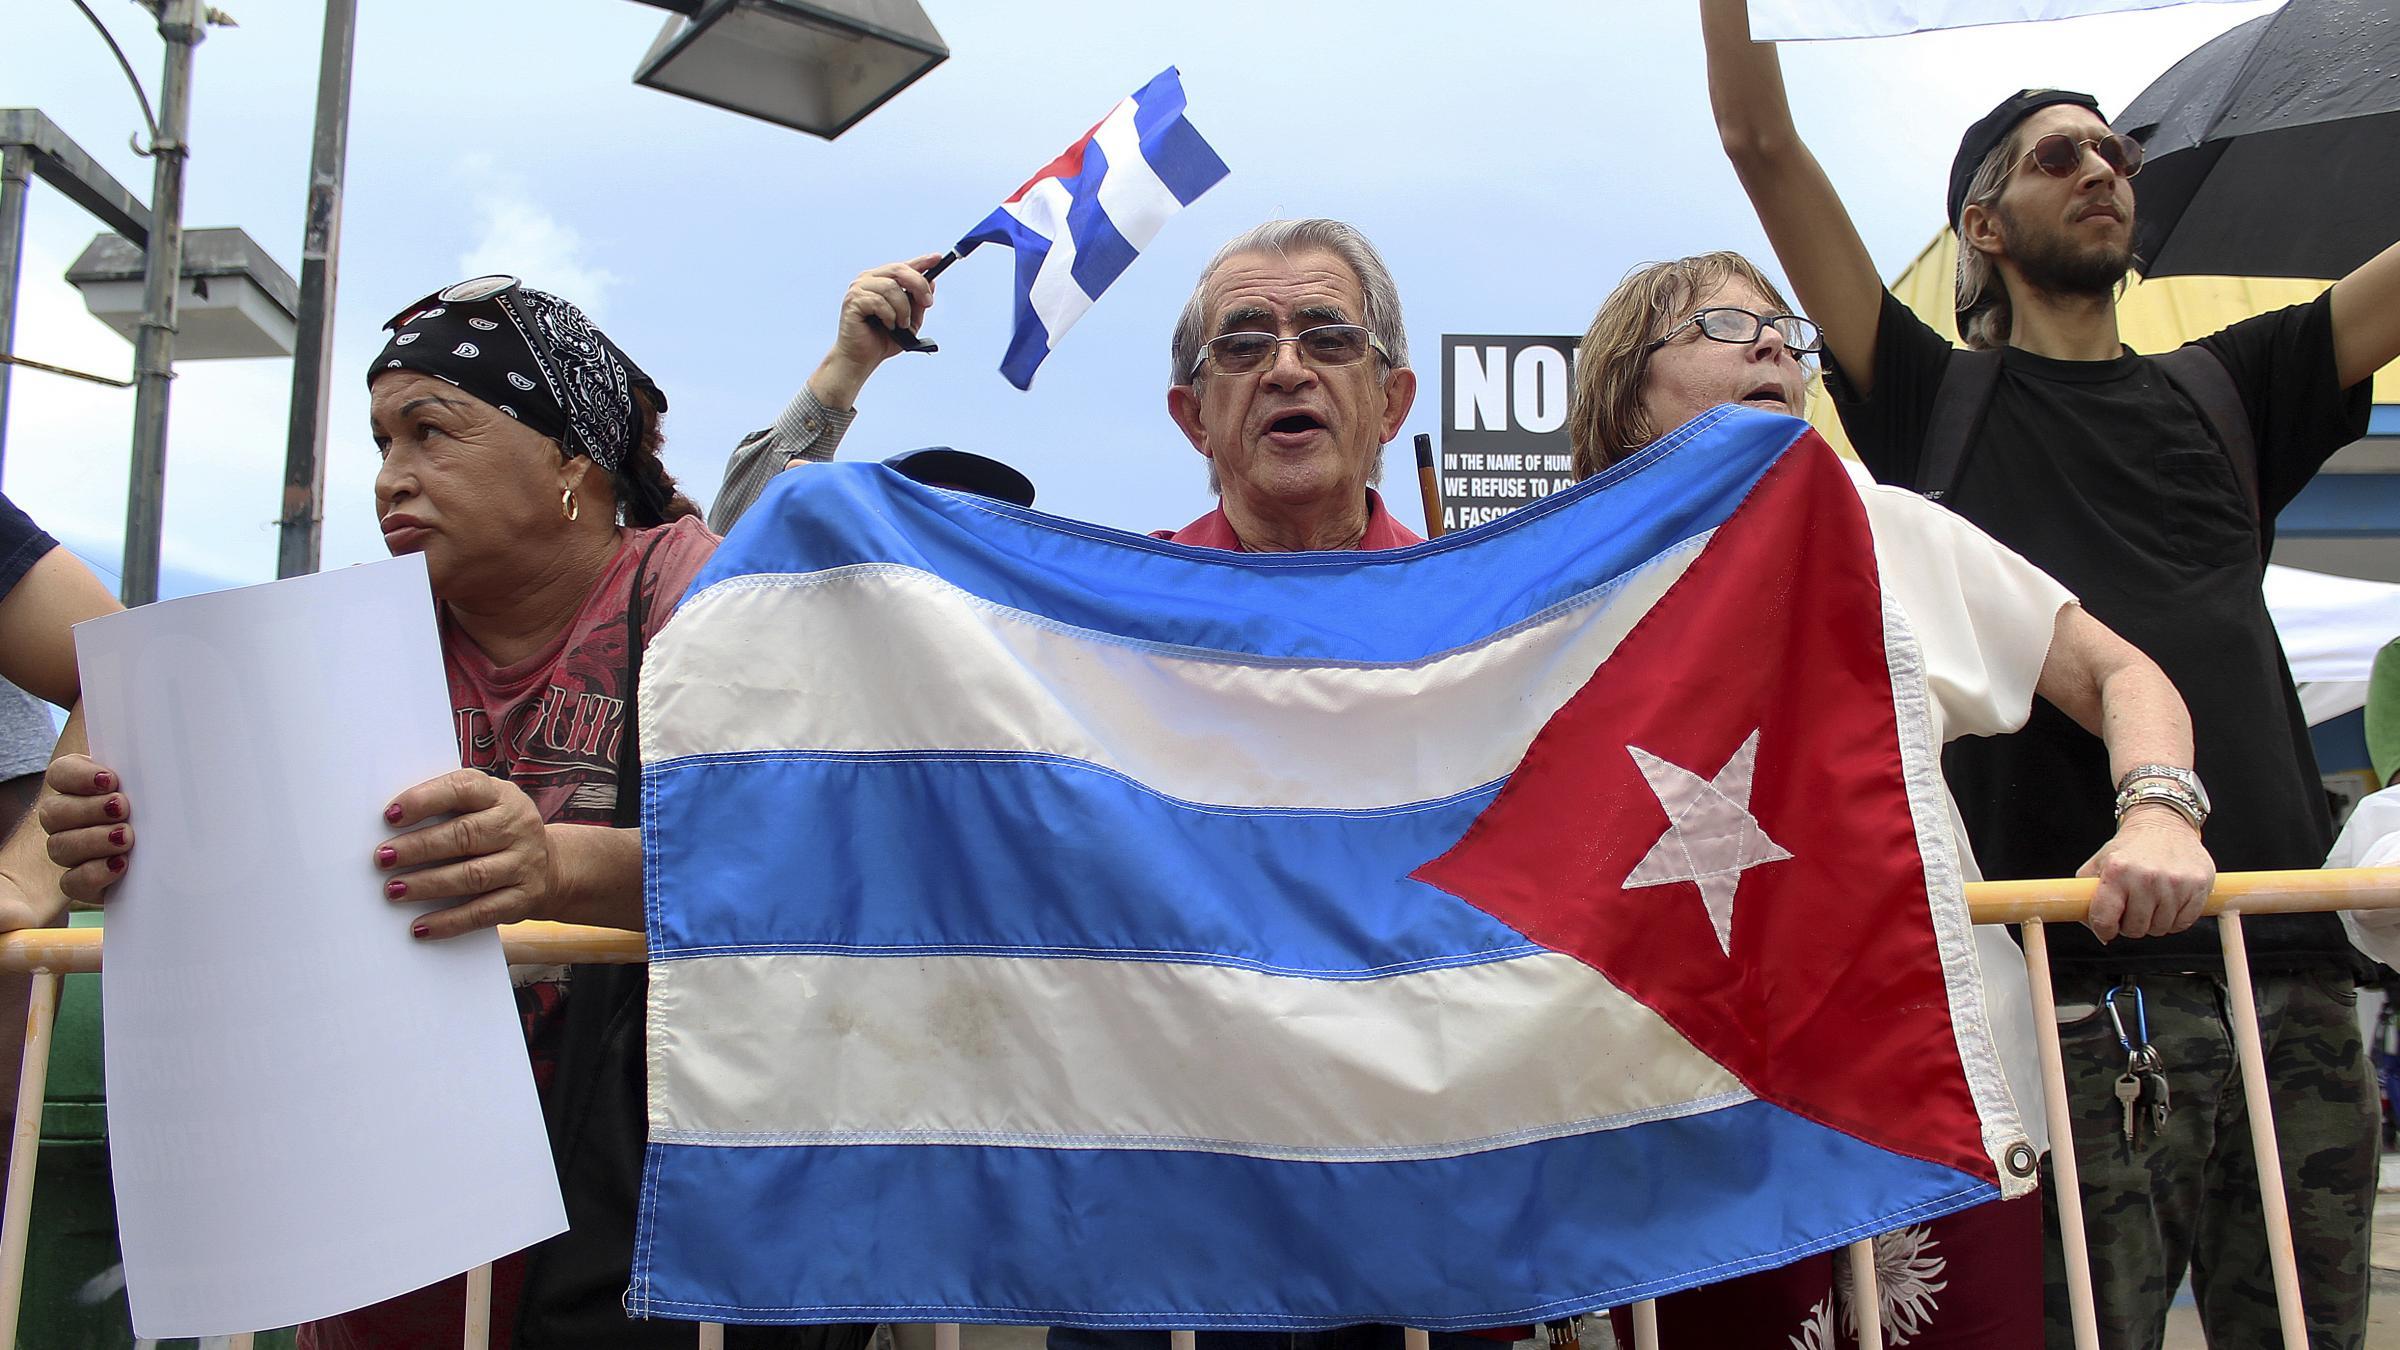 Republicans decry Trump's reversal of Cuba policies